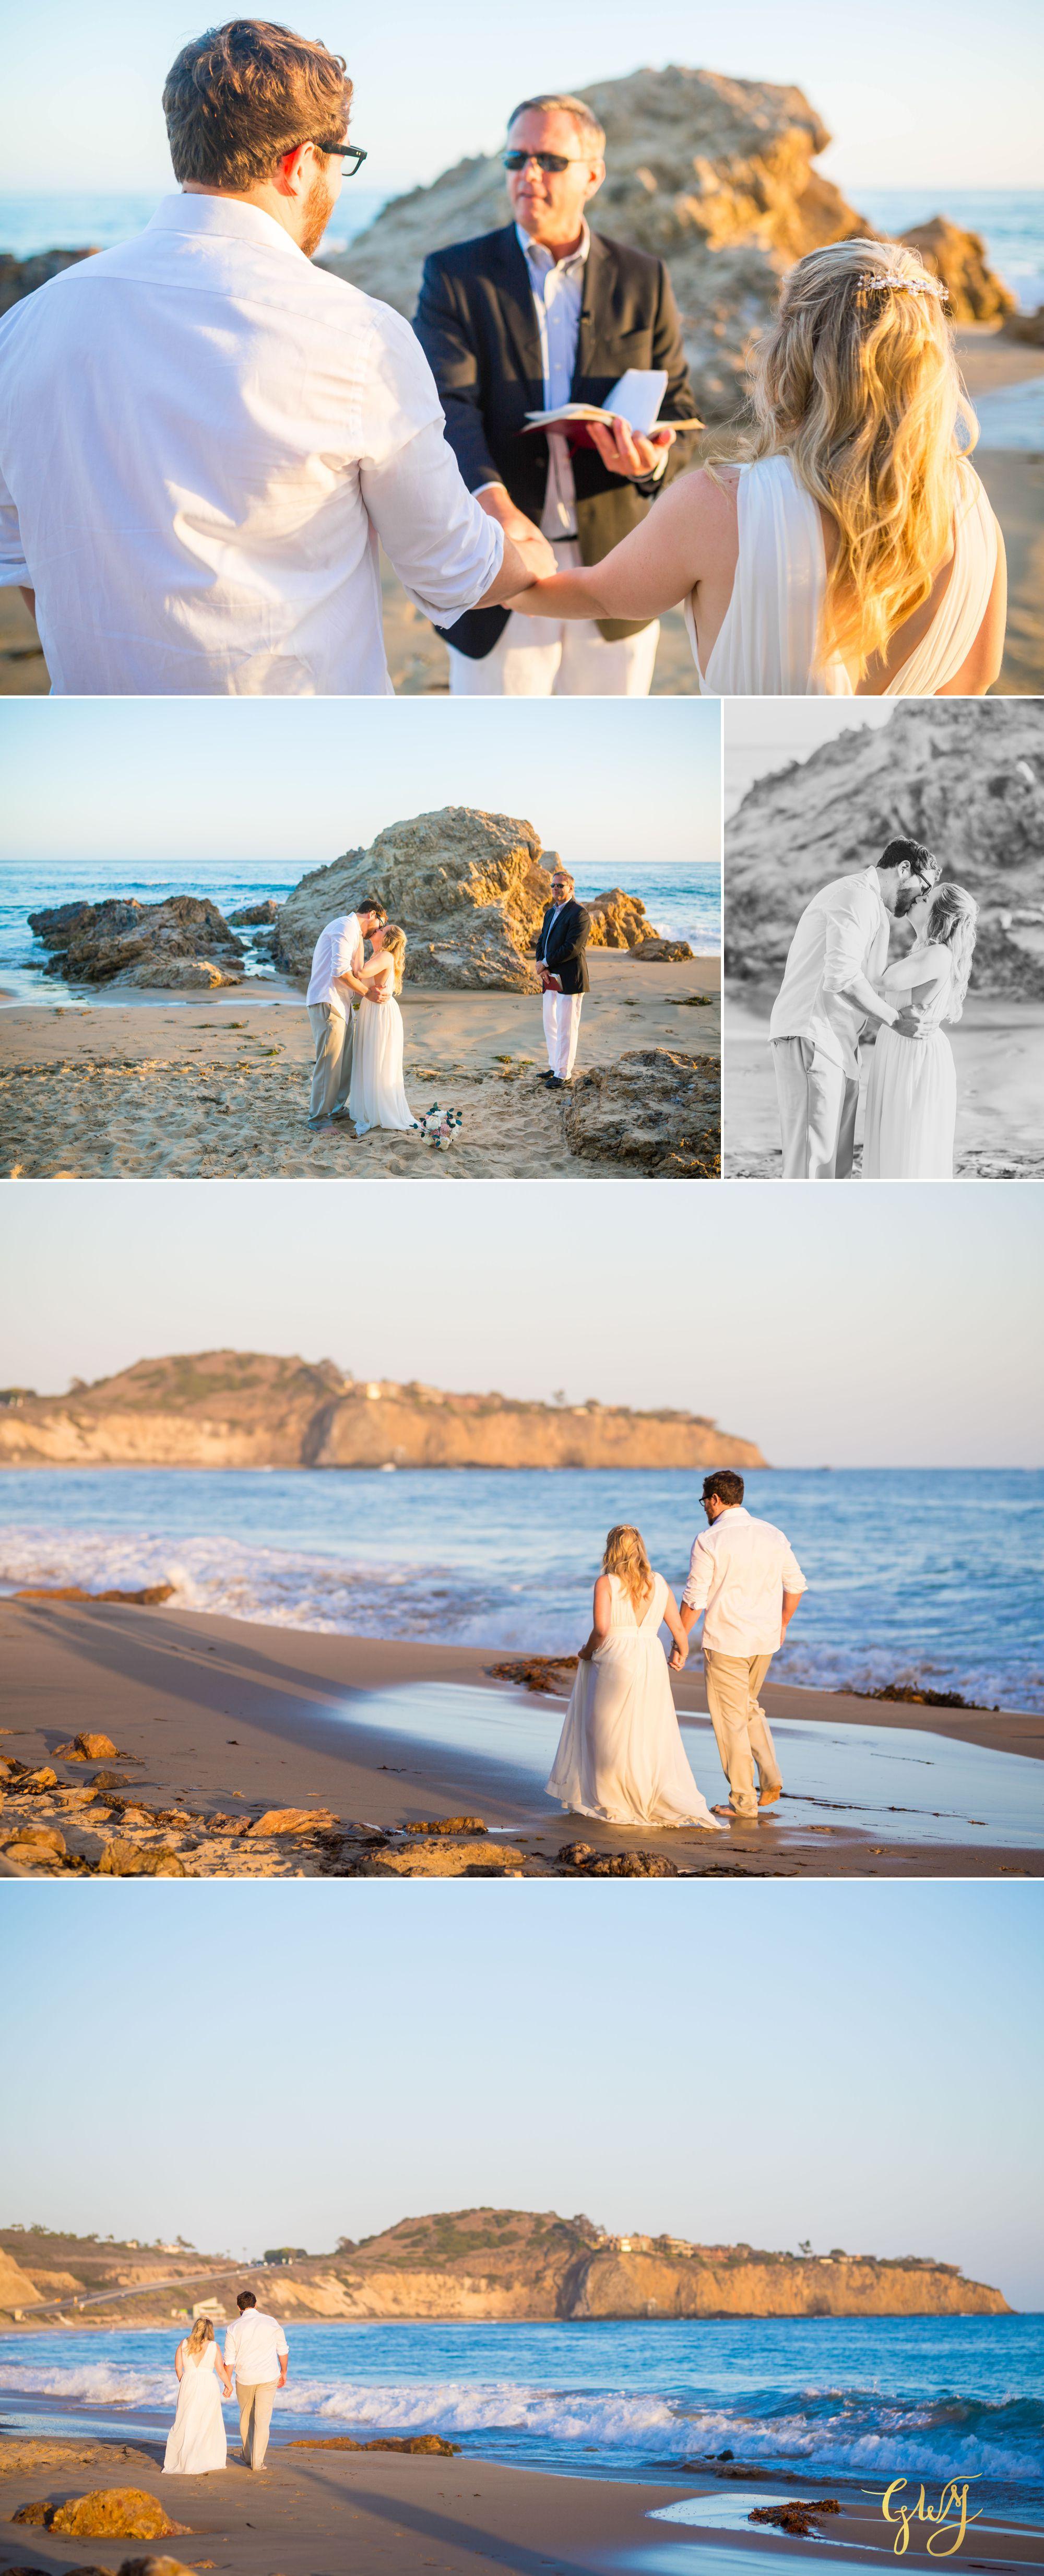 Amanda + Joe Reef Point Crystal Cove Newport Beach Sunset Romantic Intimate Elopement by Glass Woods Media 13.jpg